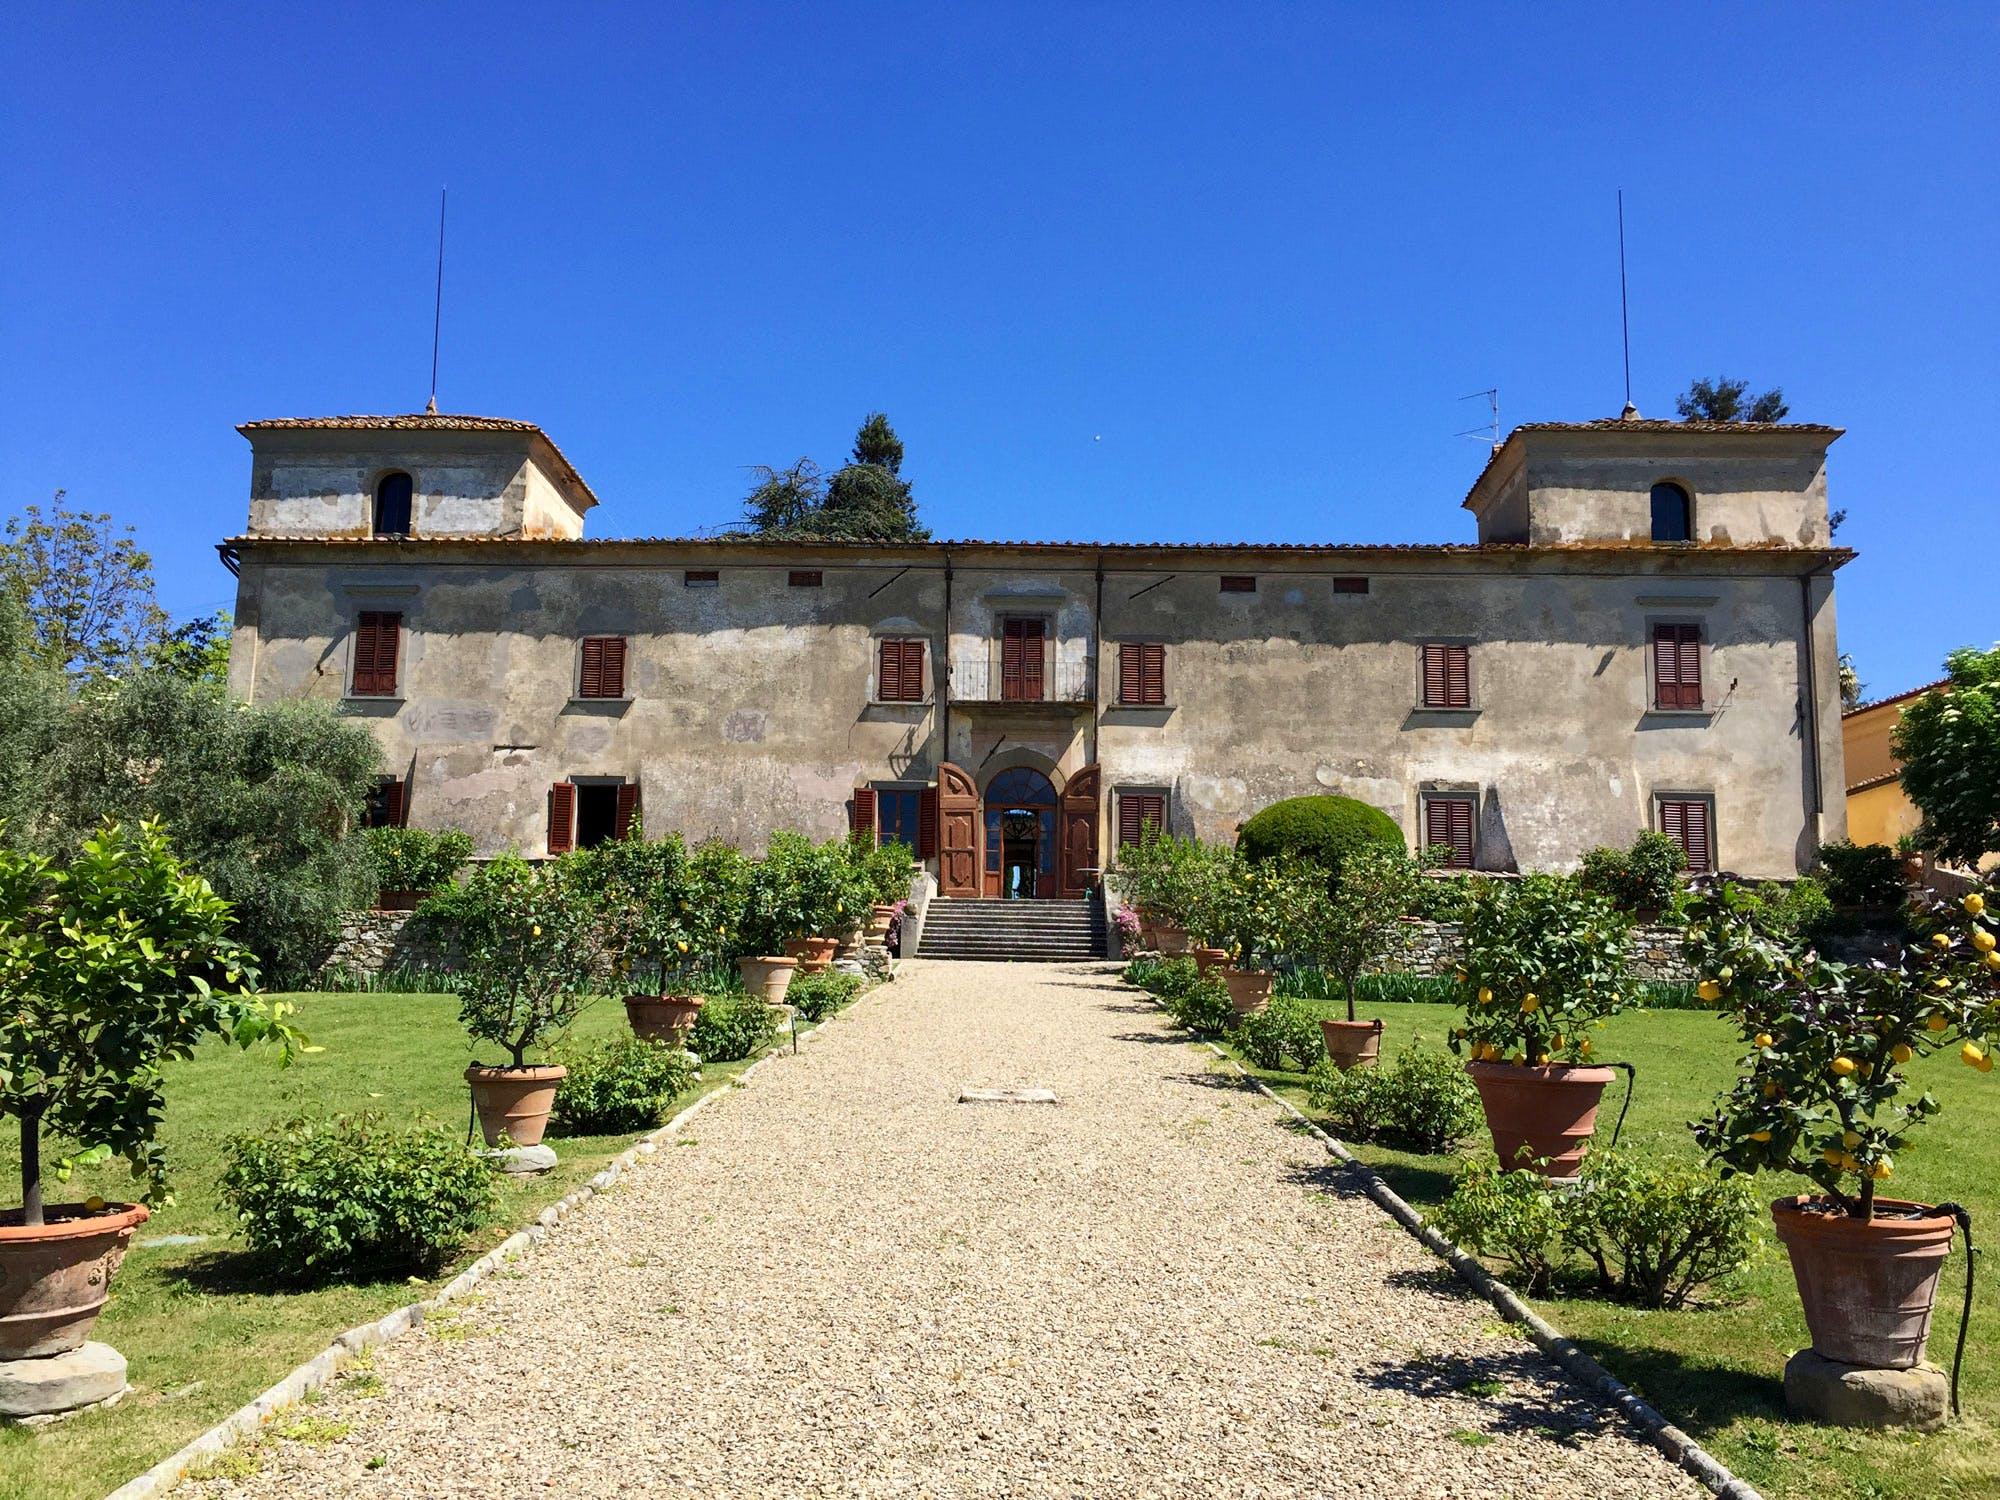 Villa Medicea Di Lilliano Luxury Residences Near Florence